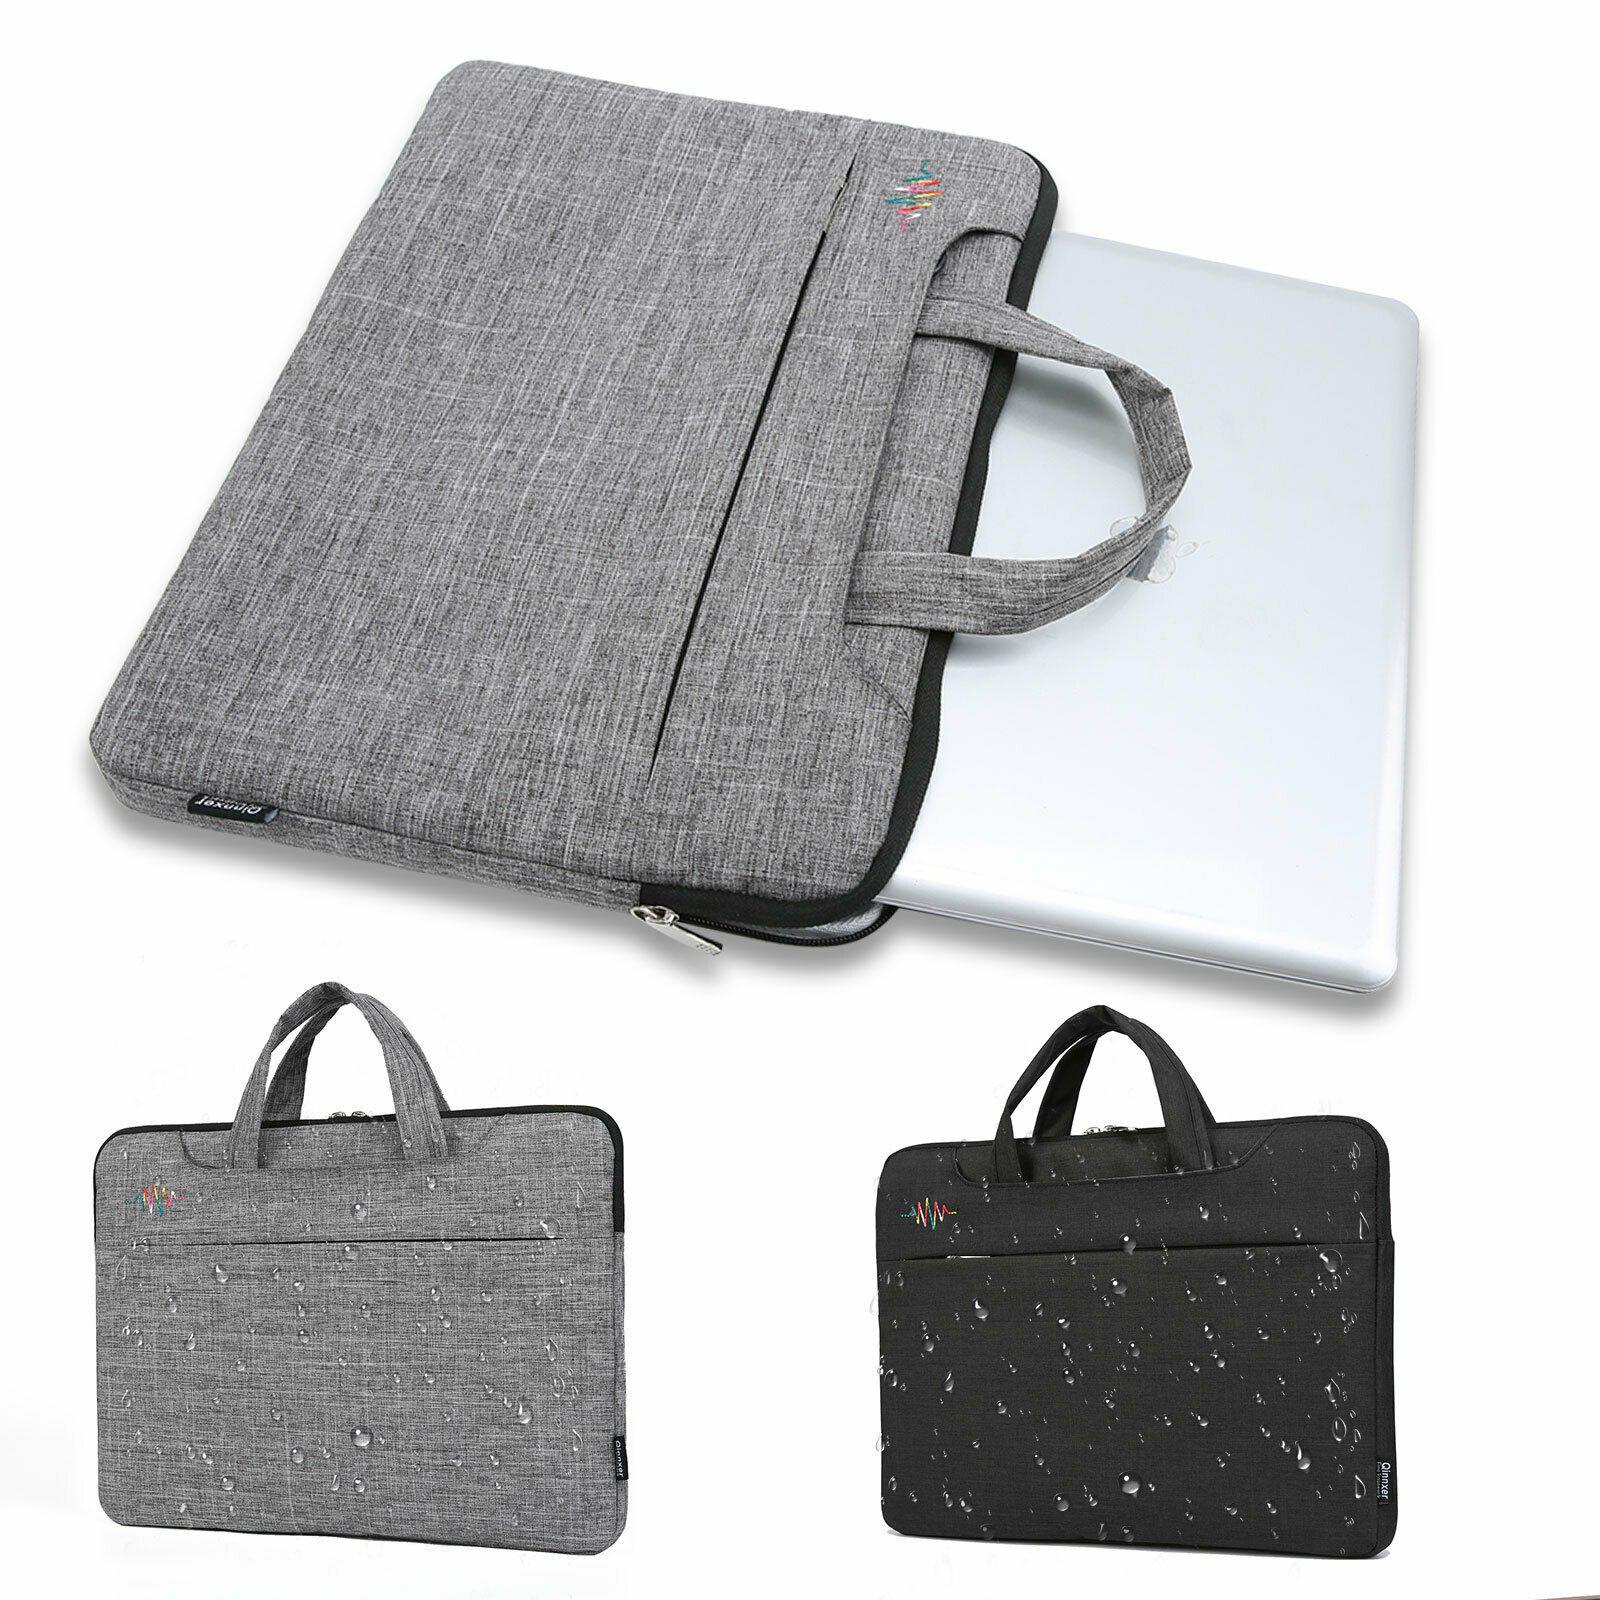 Laptop Shoulder Bag Handle Sleeve Carry Case Cover for 14